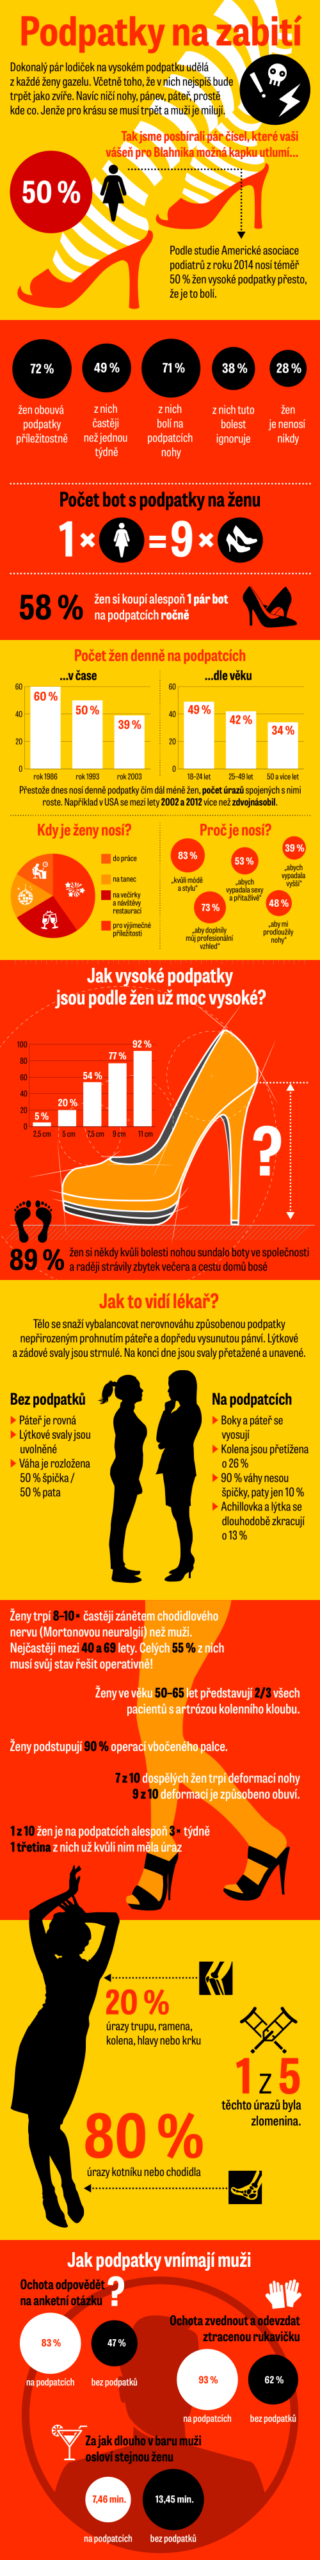 podpatky infografika